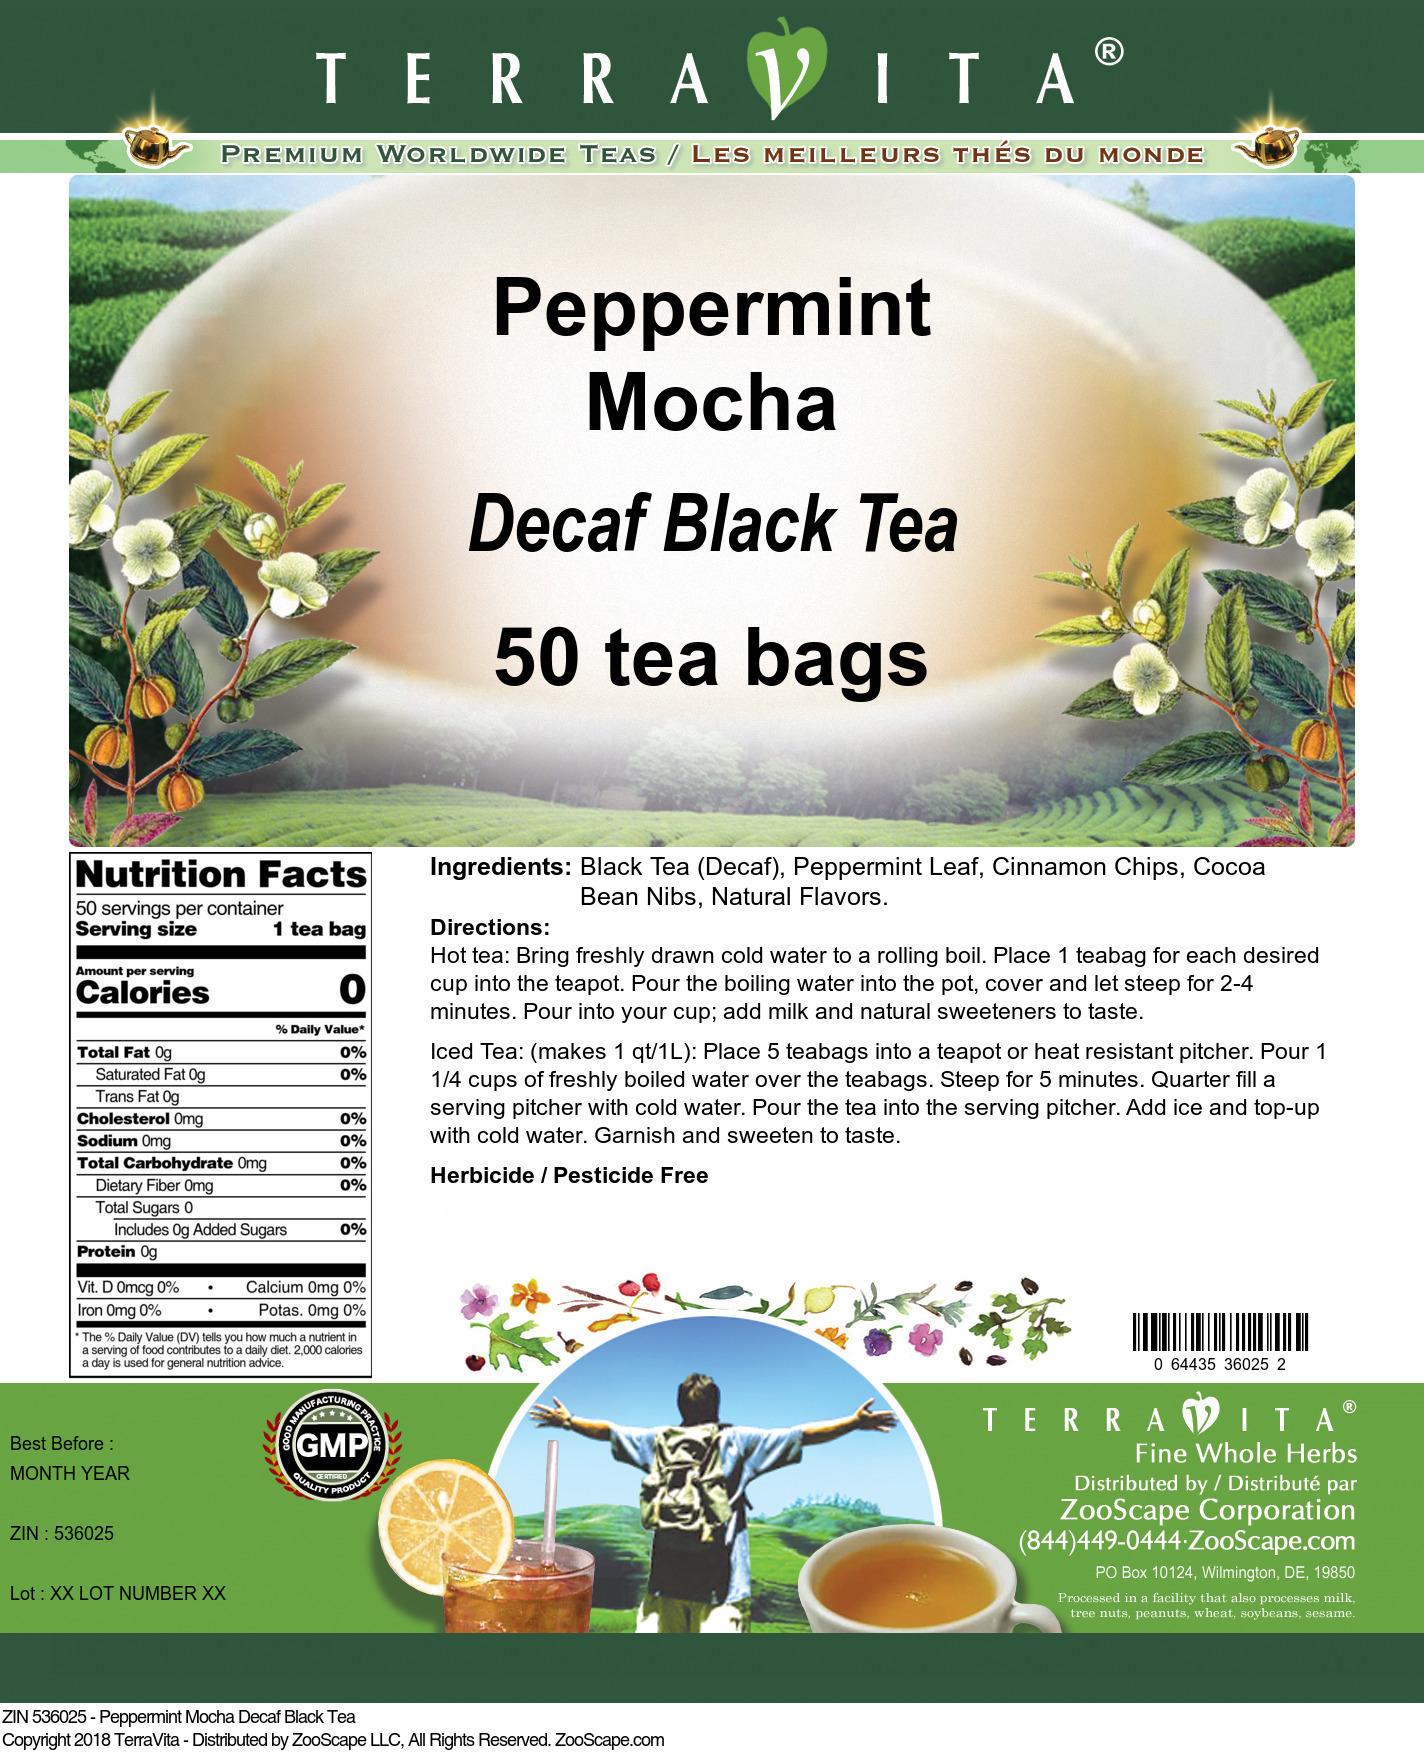 Peppermint Mocha Decaf Black Tea